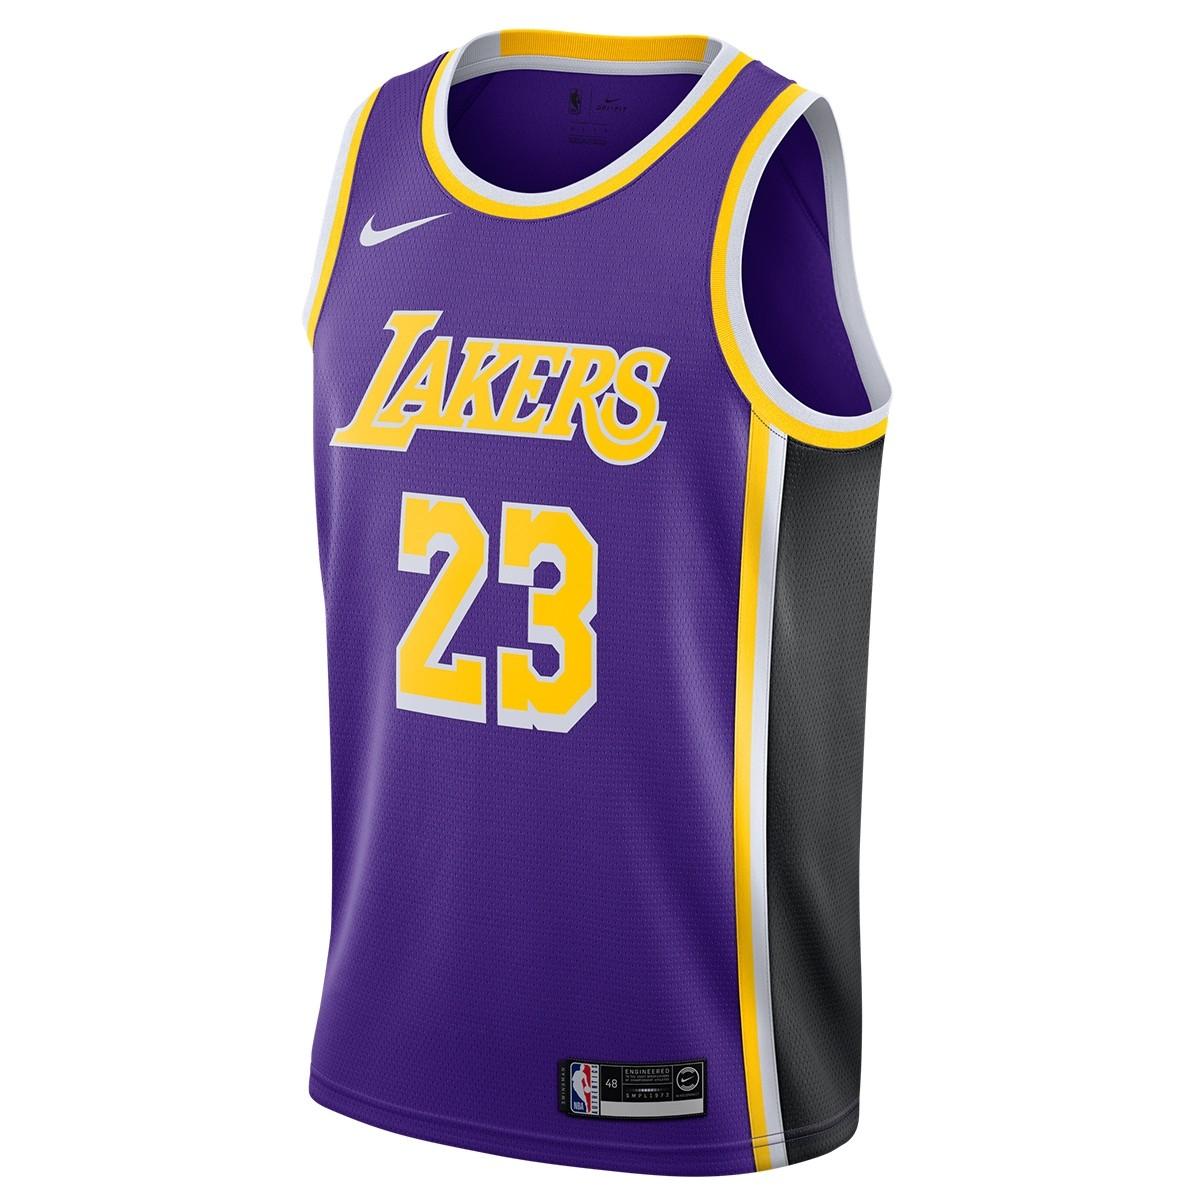 Nike NBA Lakers Swingman Jersey James ' Statement Edition'